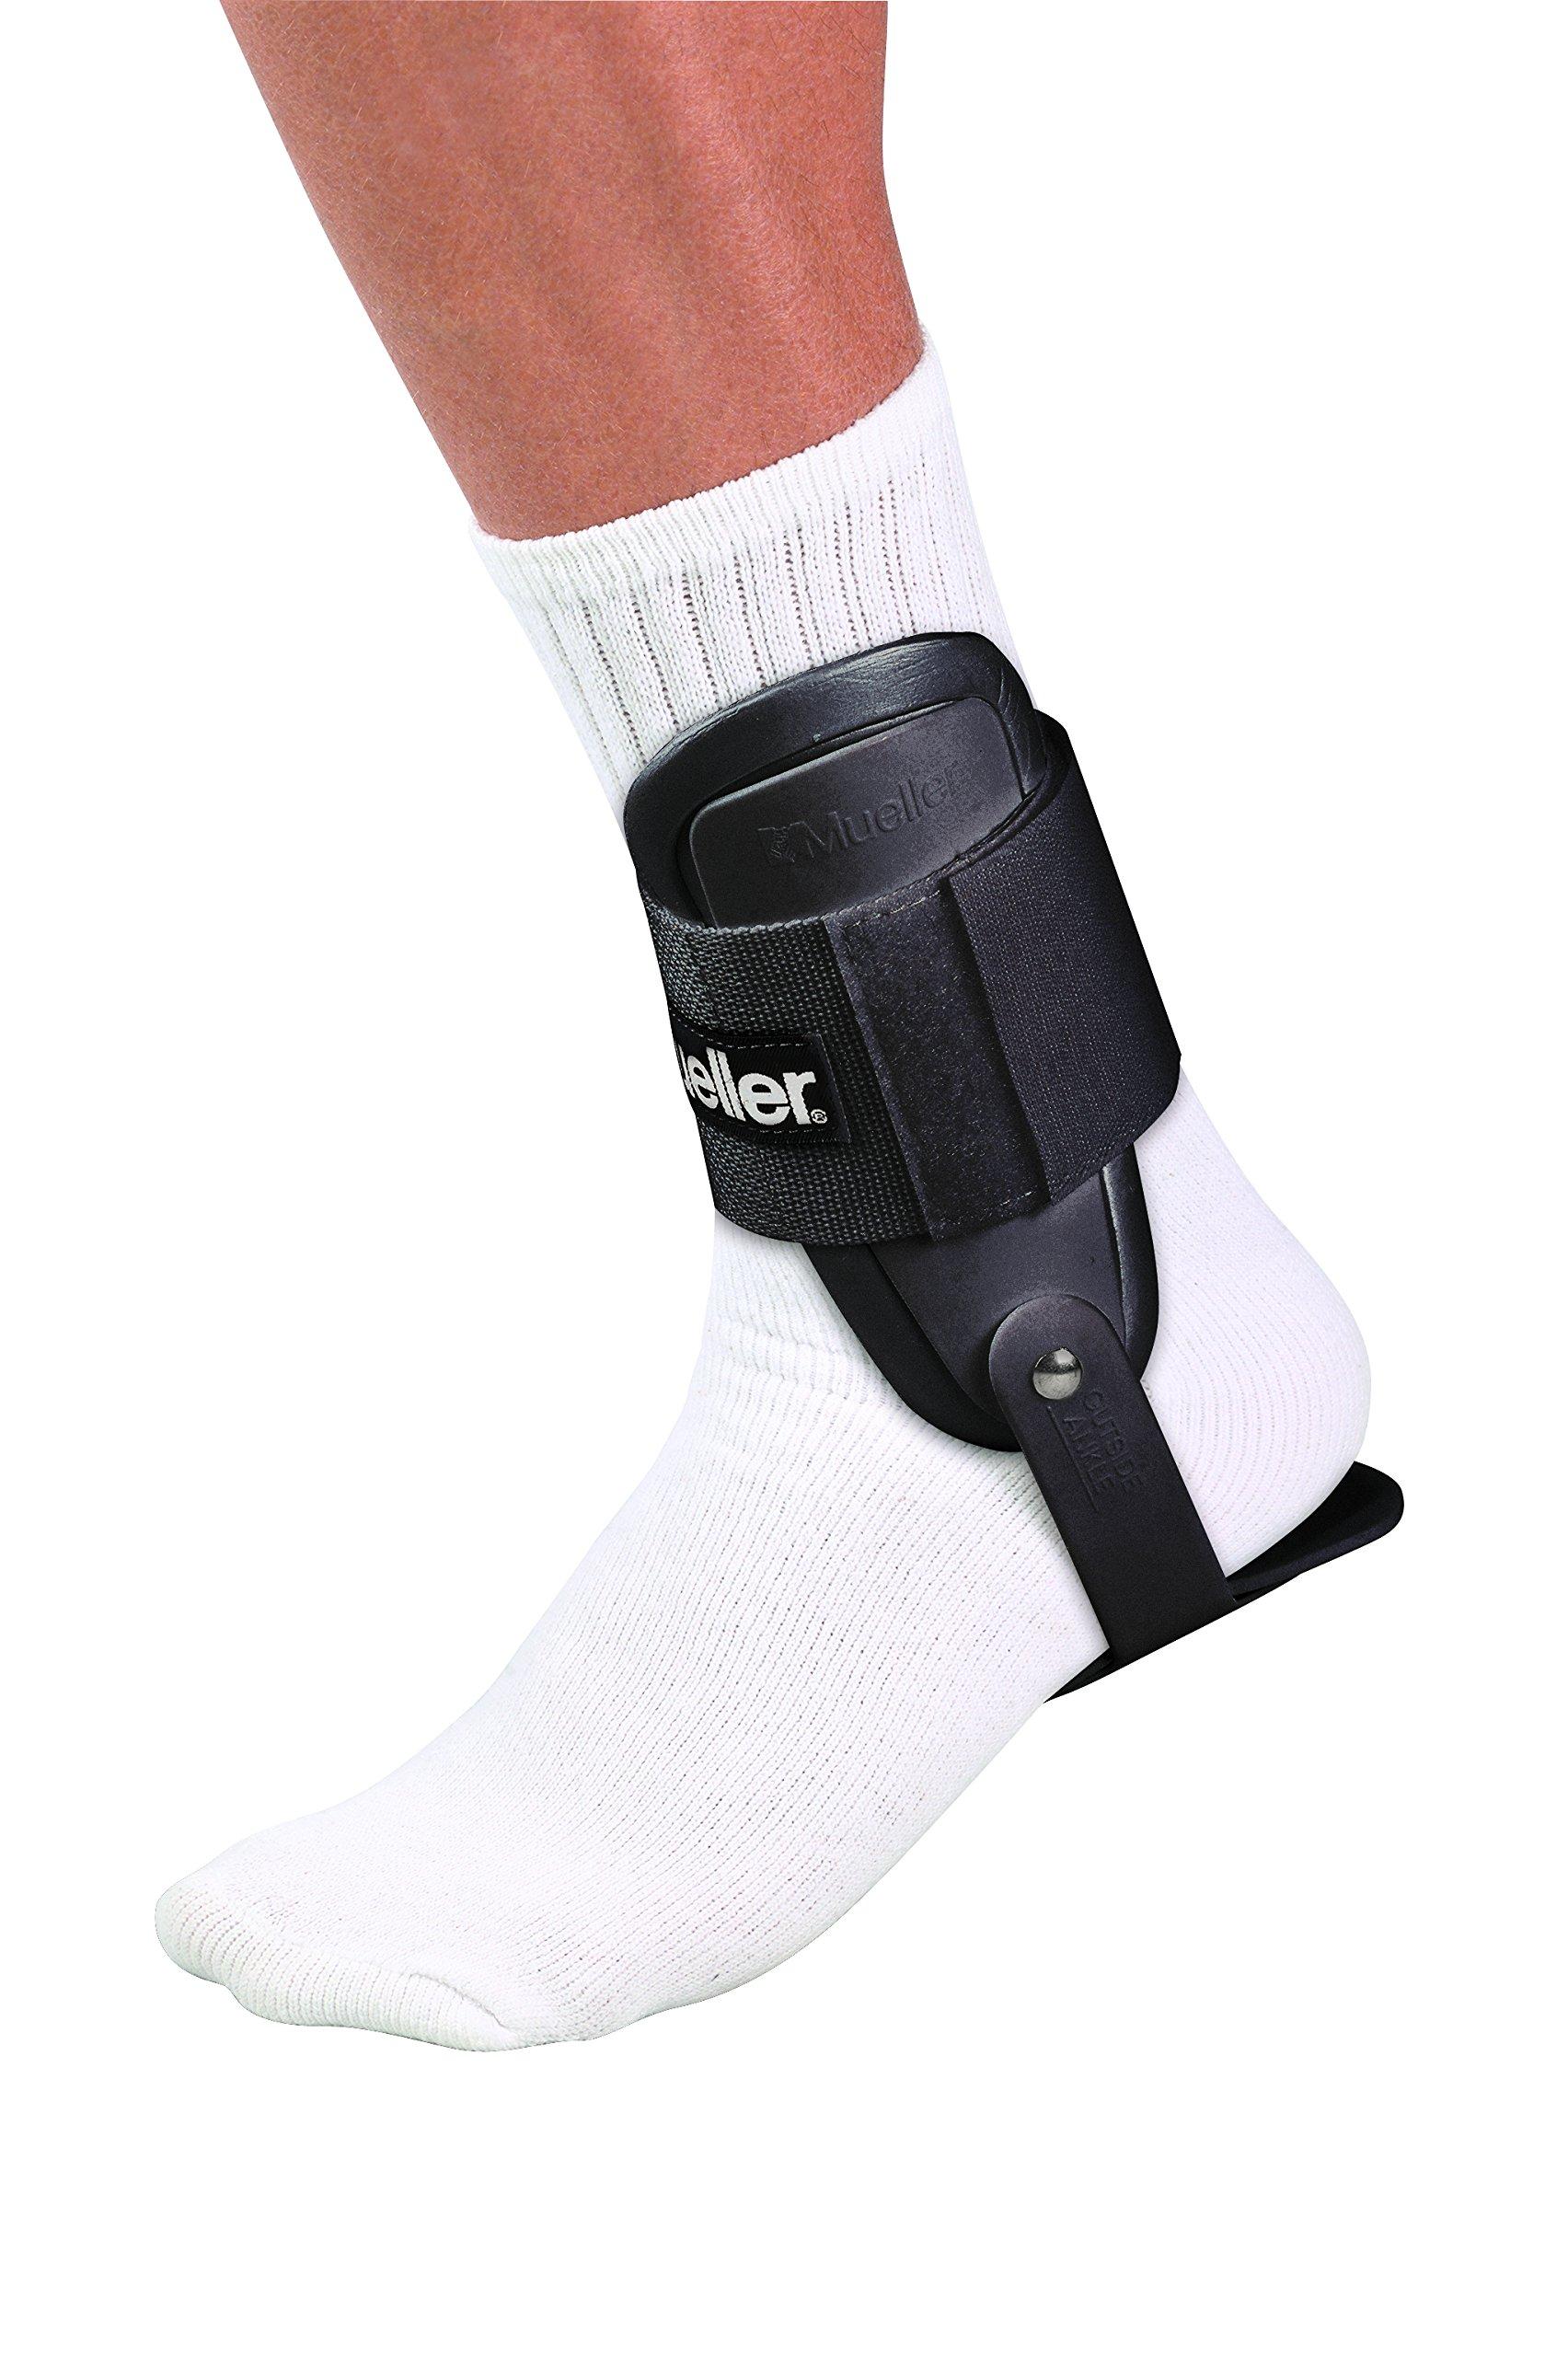 Mueller Lite Ankle Brace - Black, Black, One Size